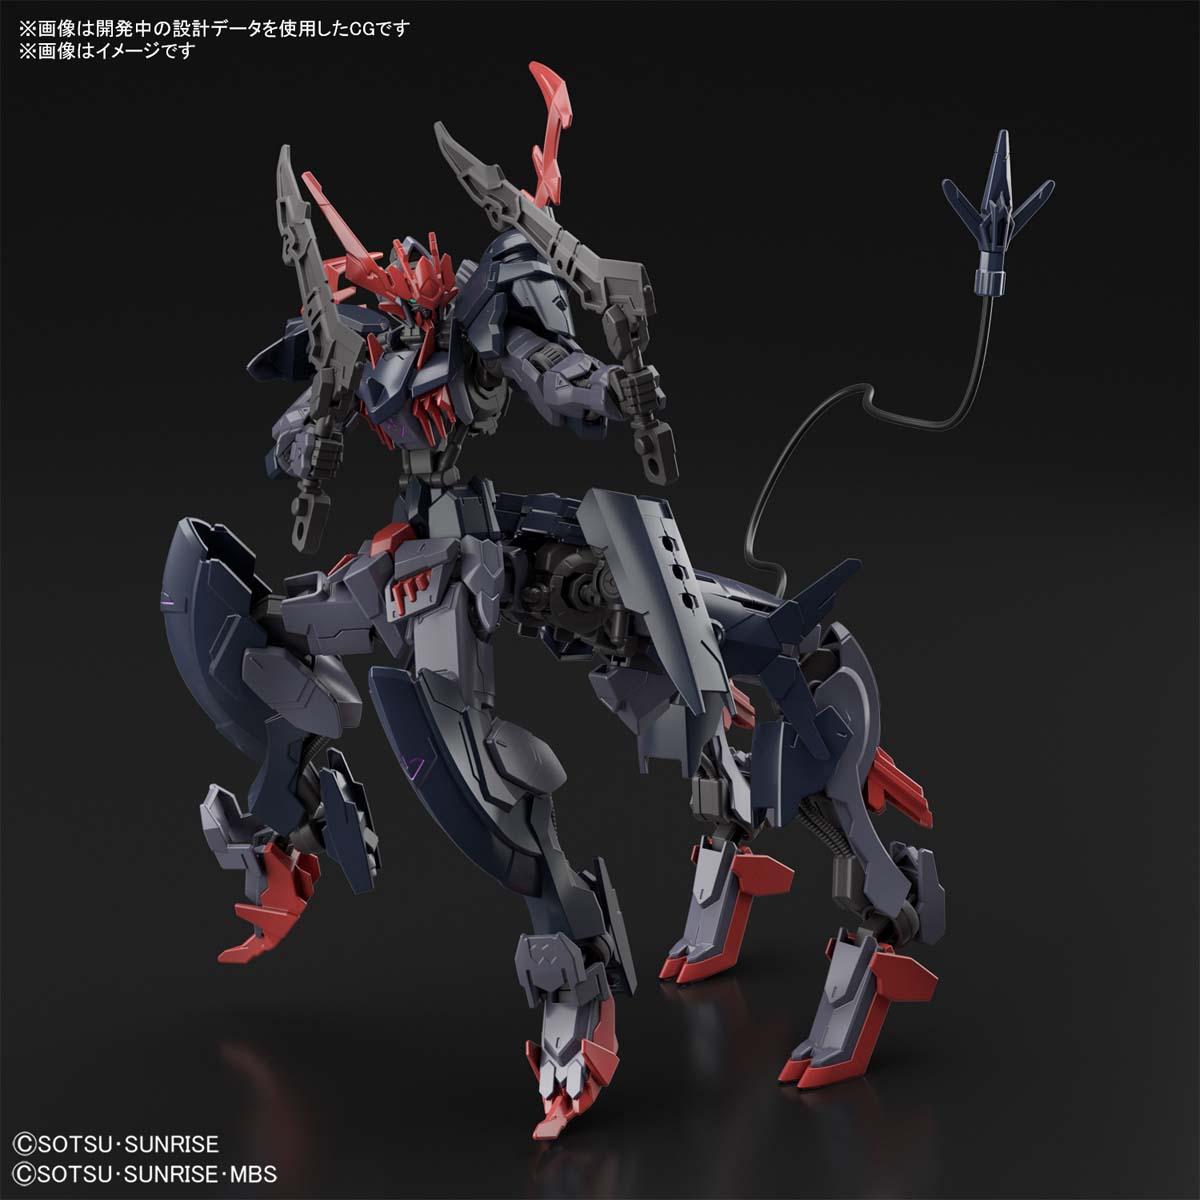 HG 1/144『ガンダムバルバタウロス』ガンダムブレイカー バトローグ プラモデル-006